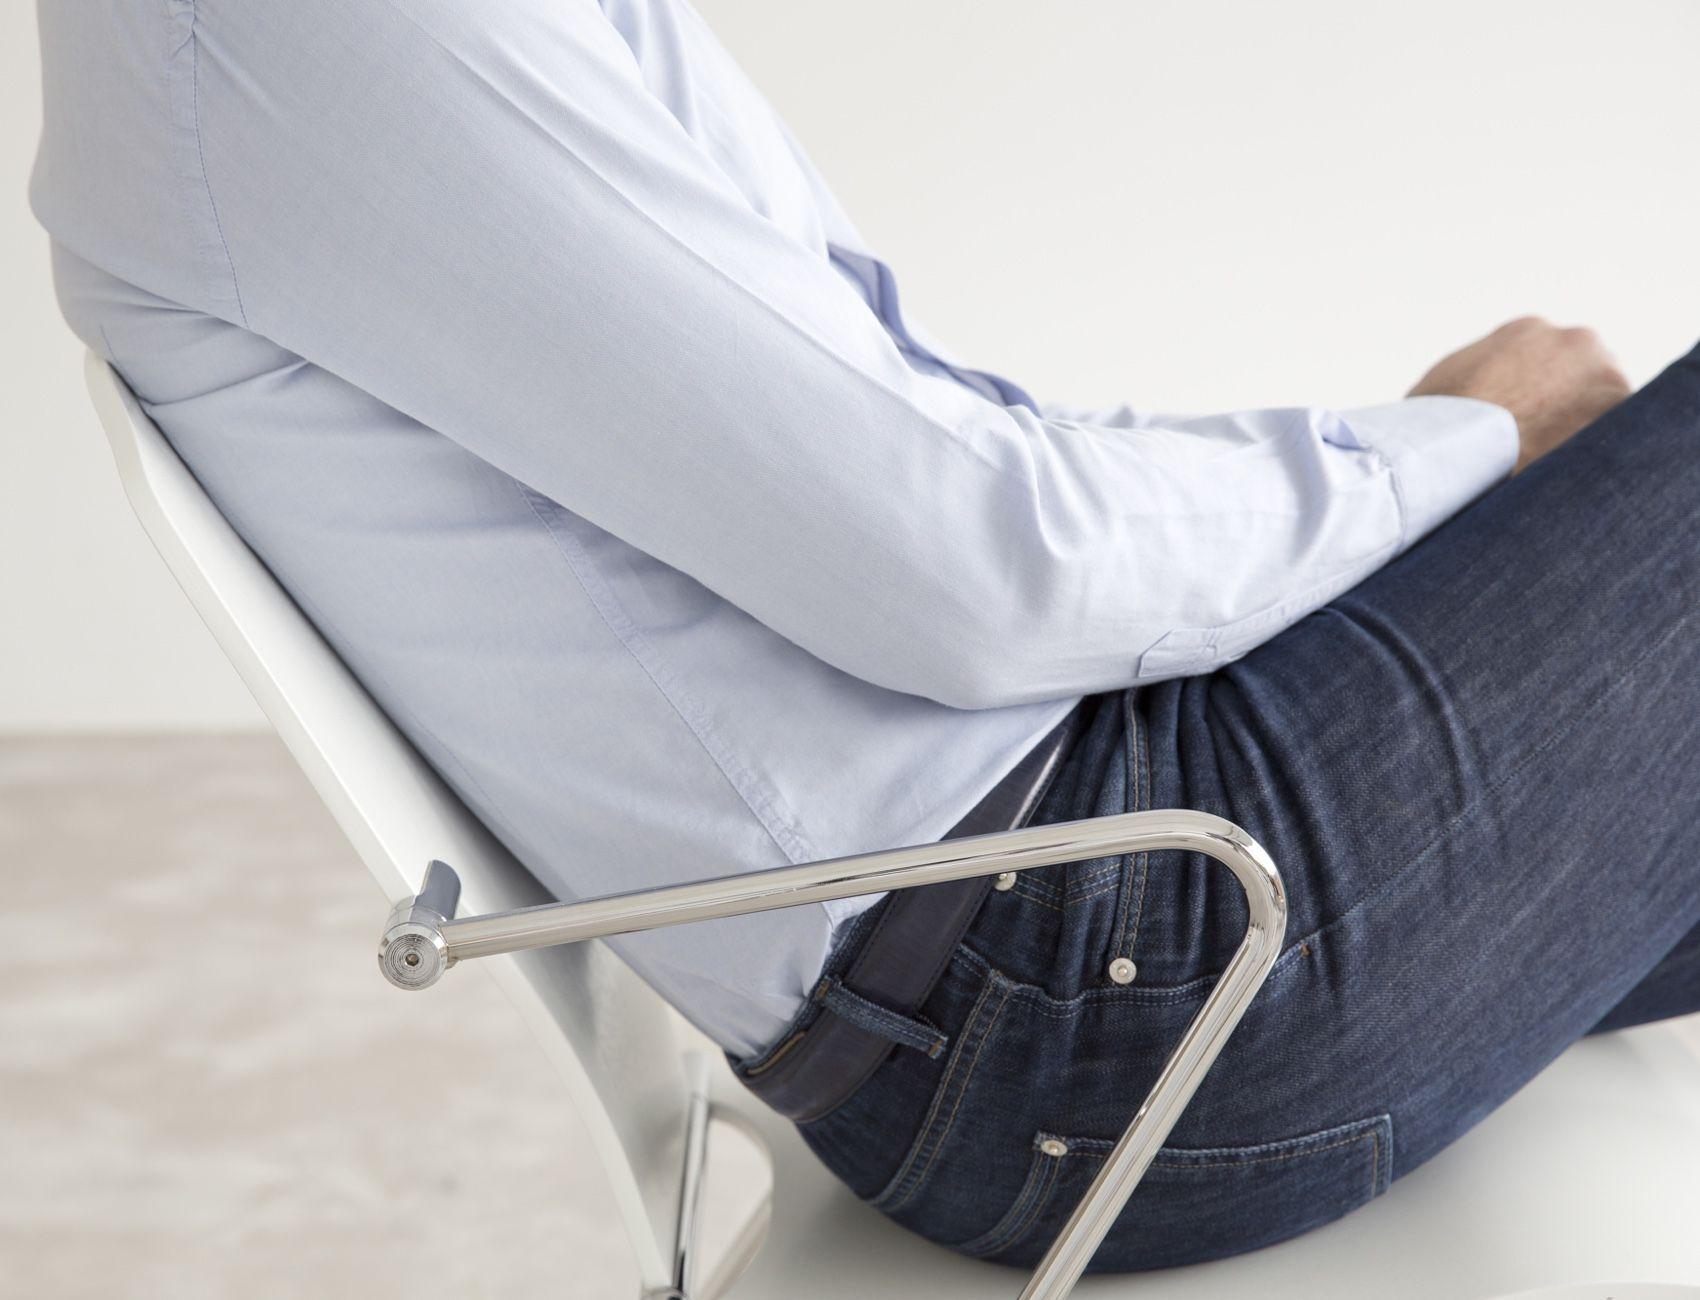 STUA Egoa Chair with flexible chrome frame